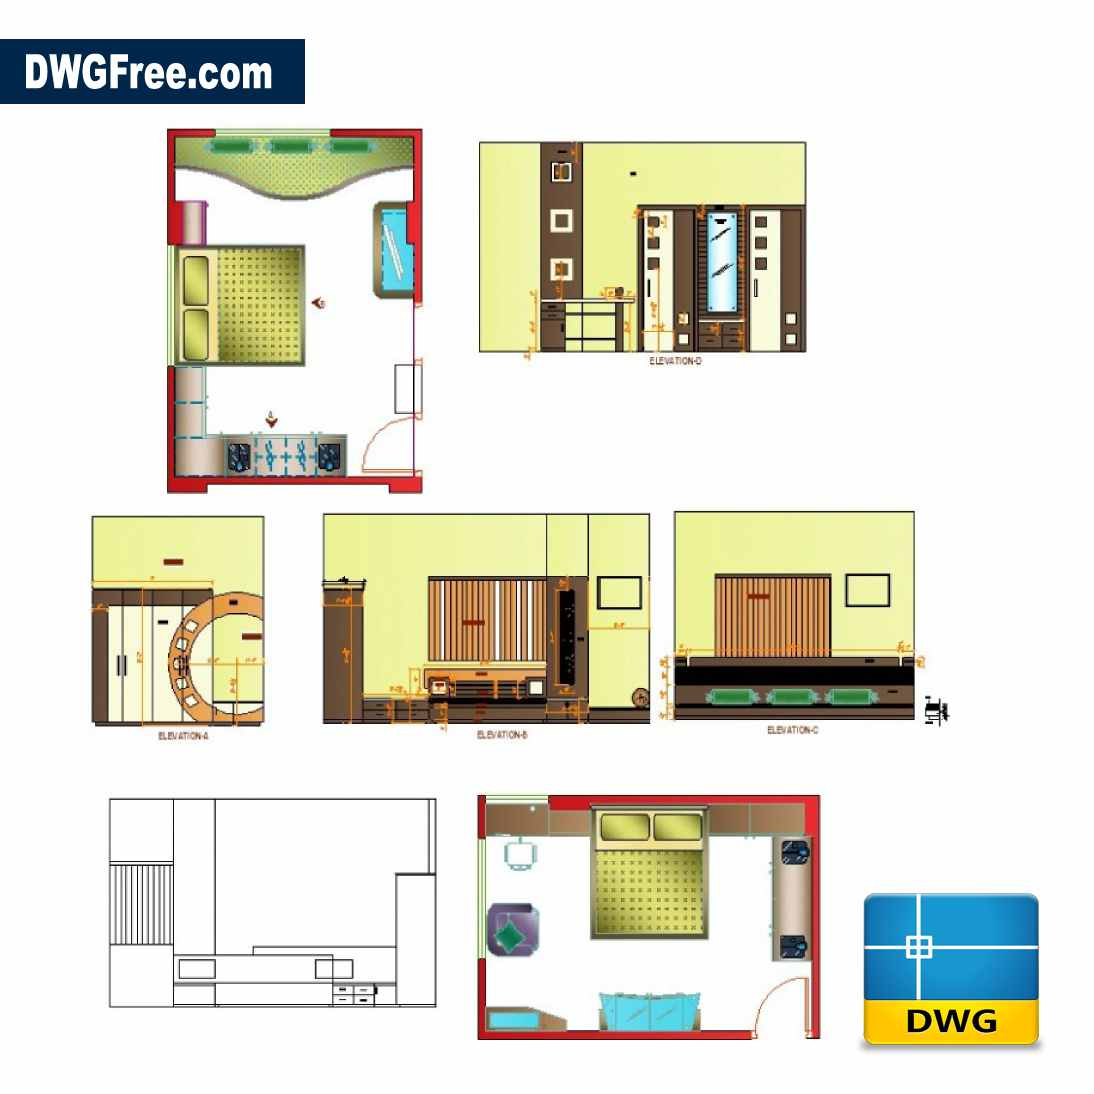 Bedroom interior design detail DWG [Drawing 14 ]  DwgFree.